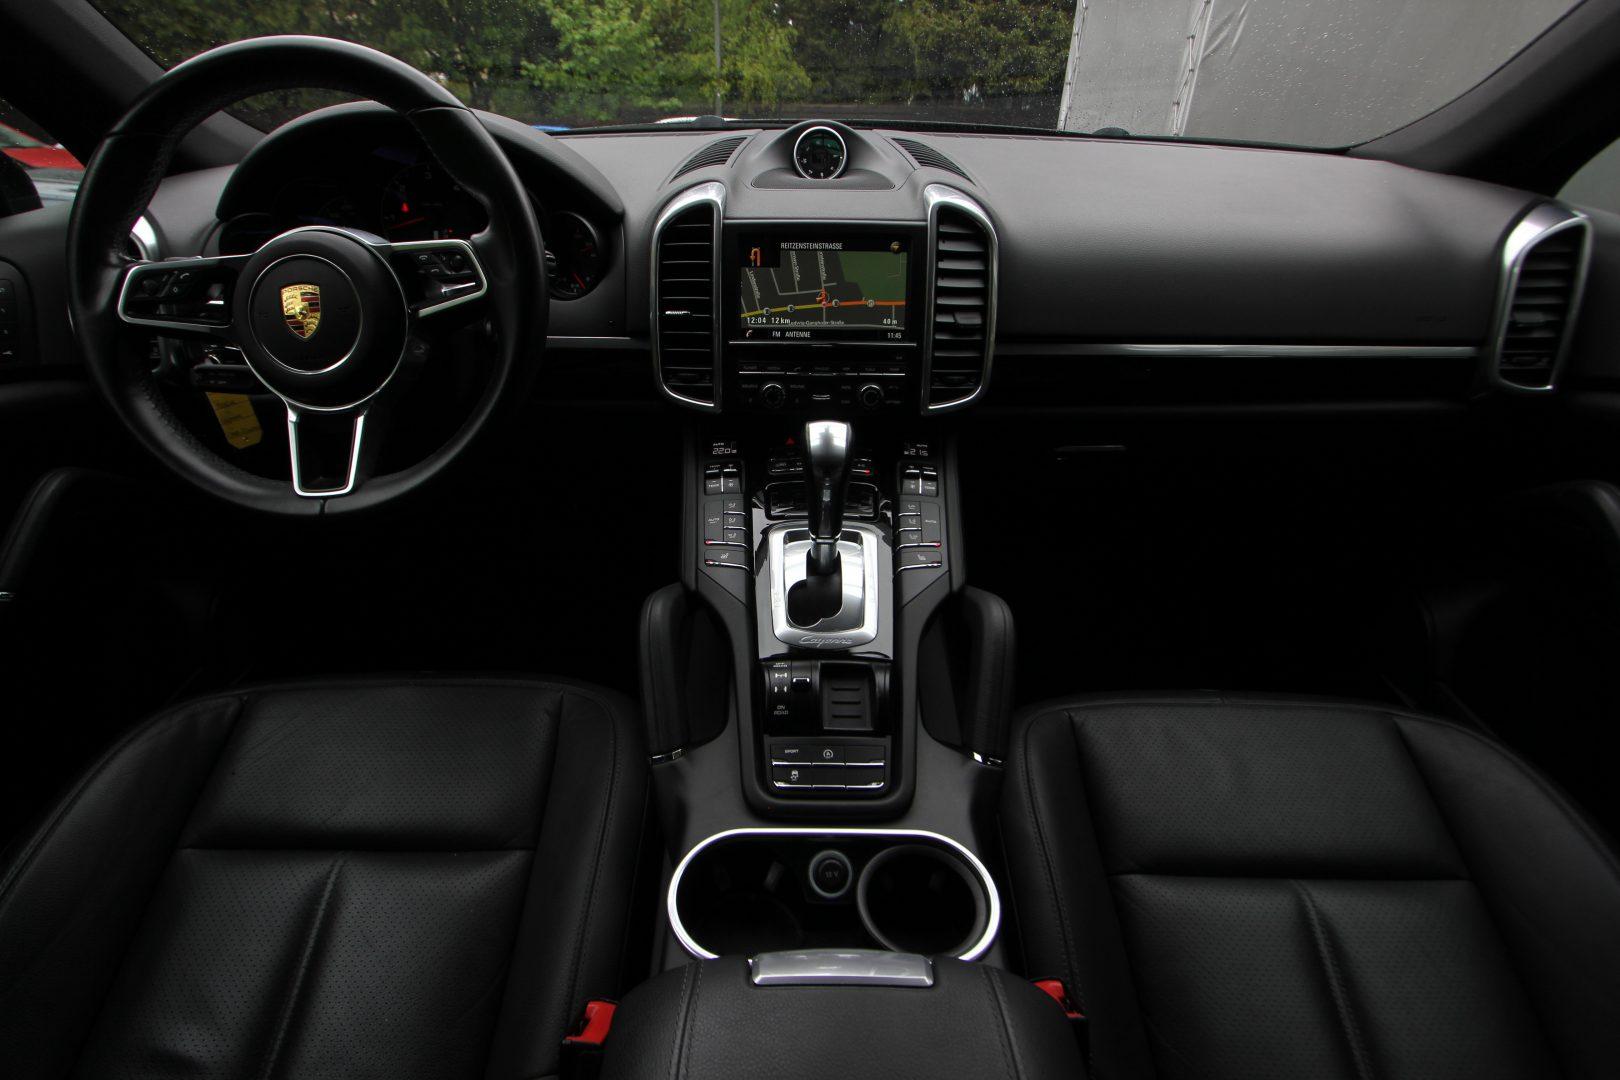 AIL Porsche Cayenne Panorama 21 Zoll  8